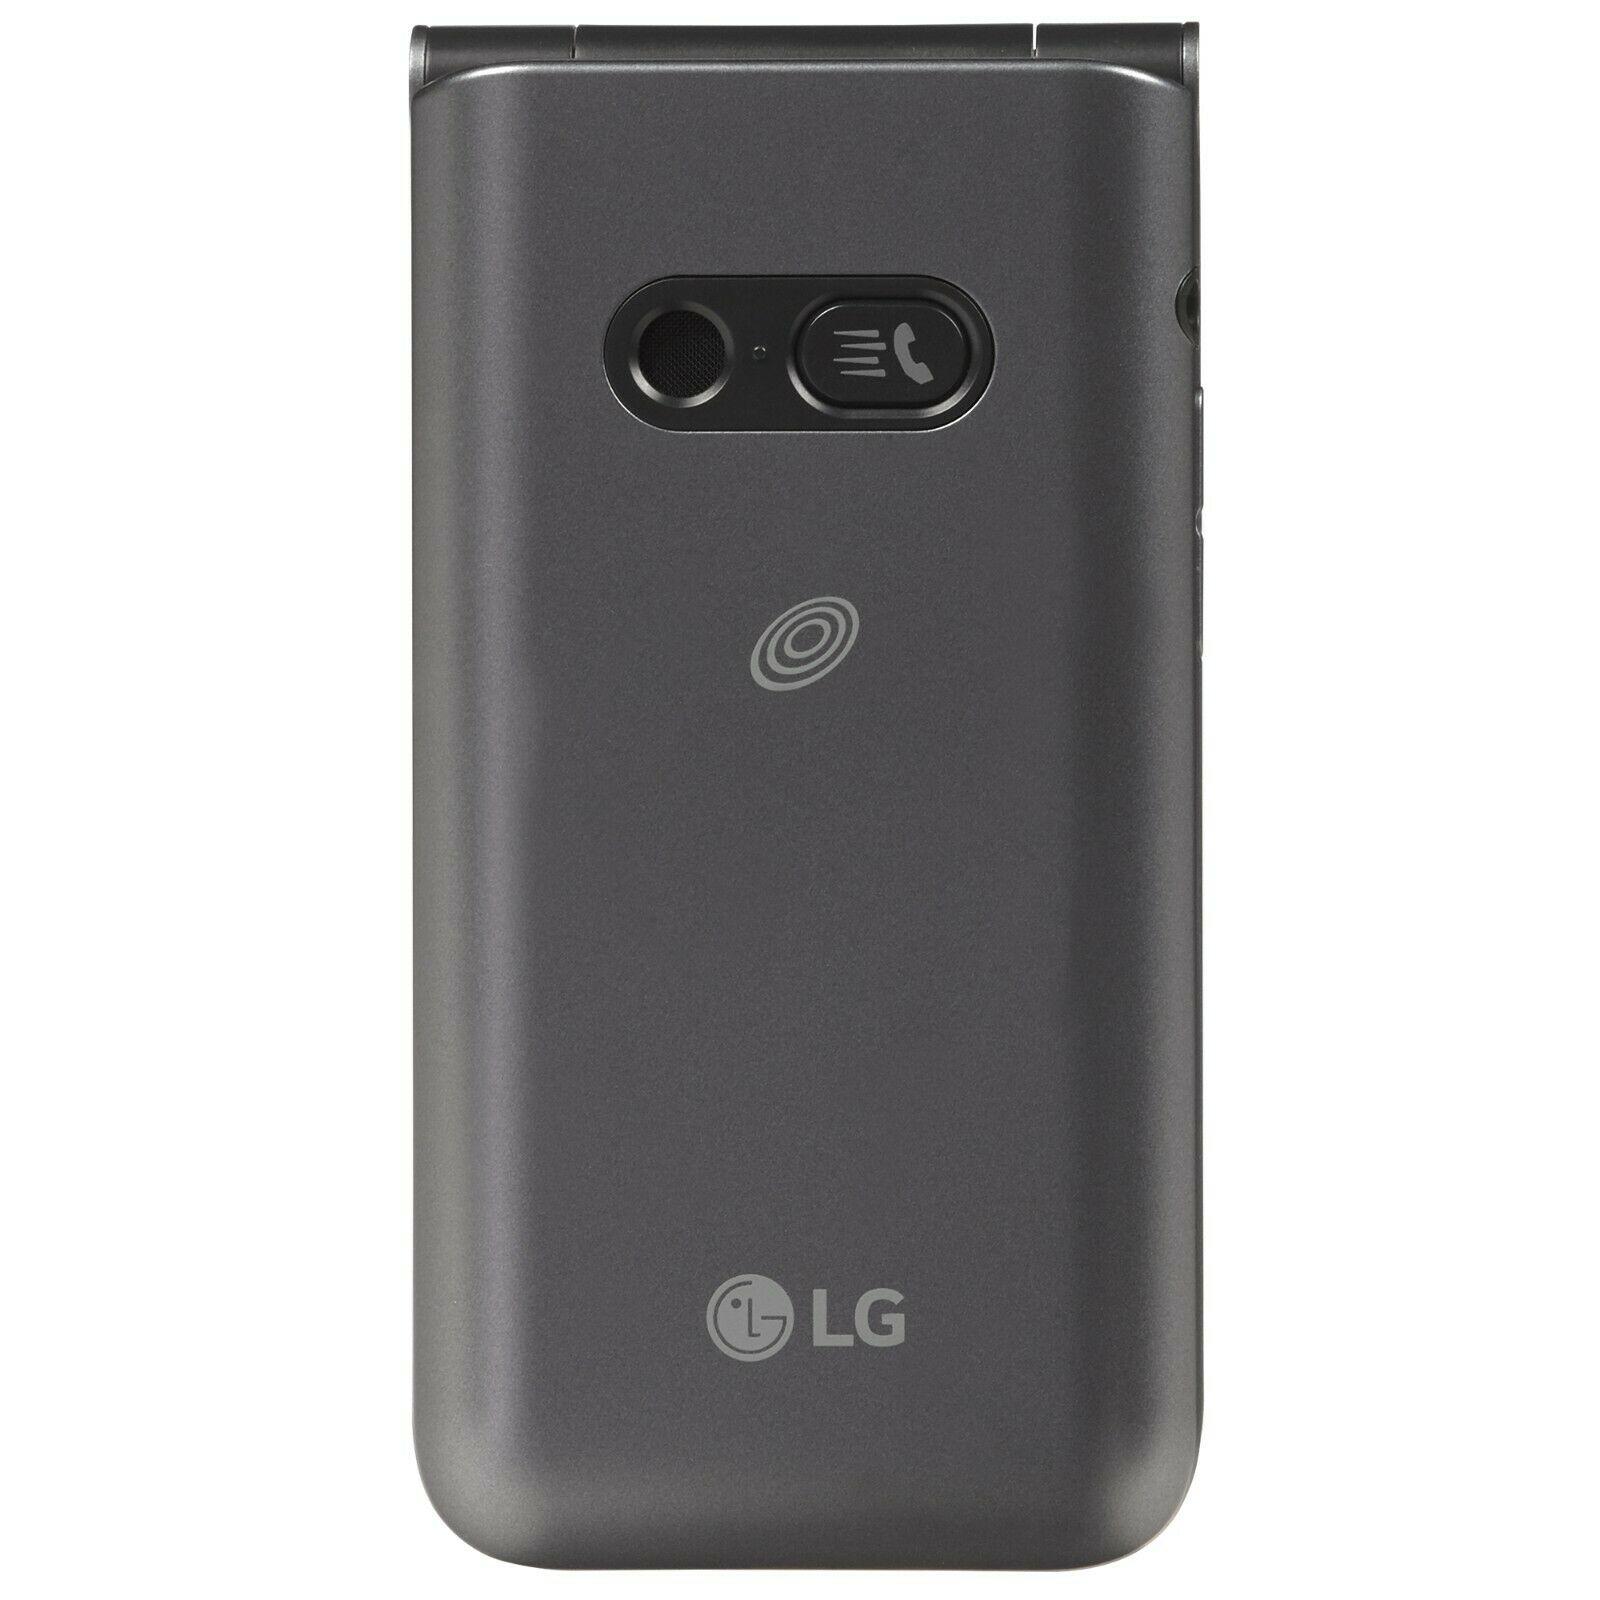 LG Classic Flip Camera